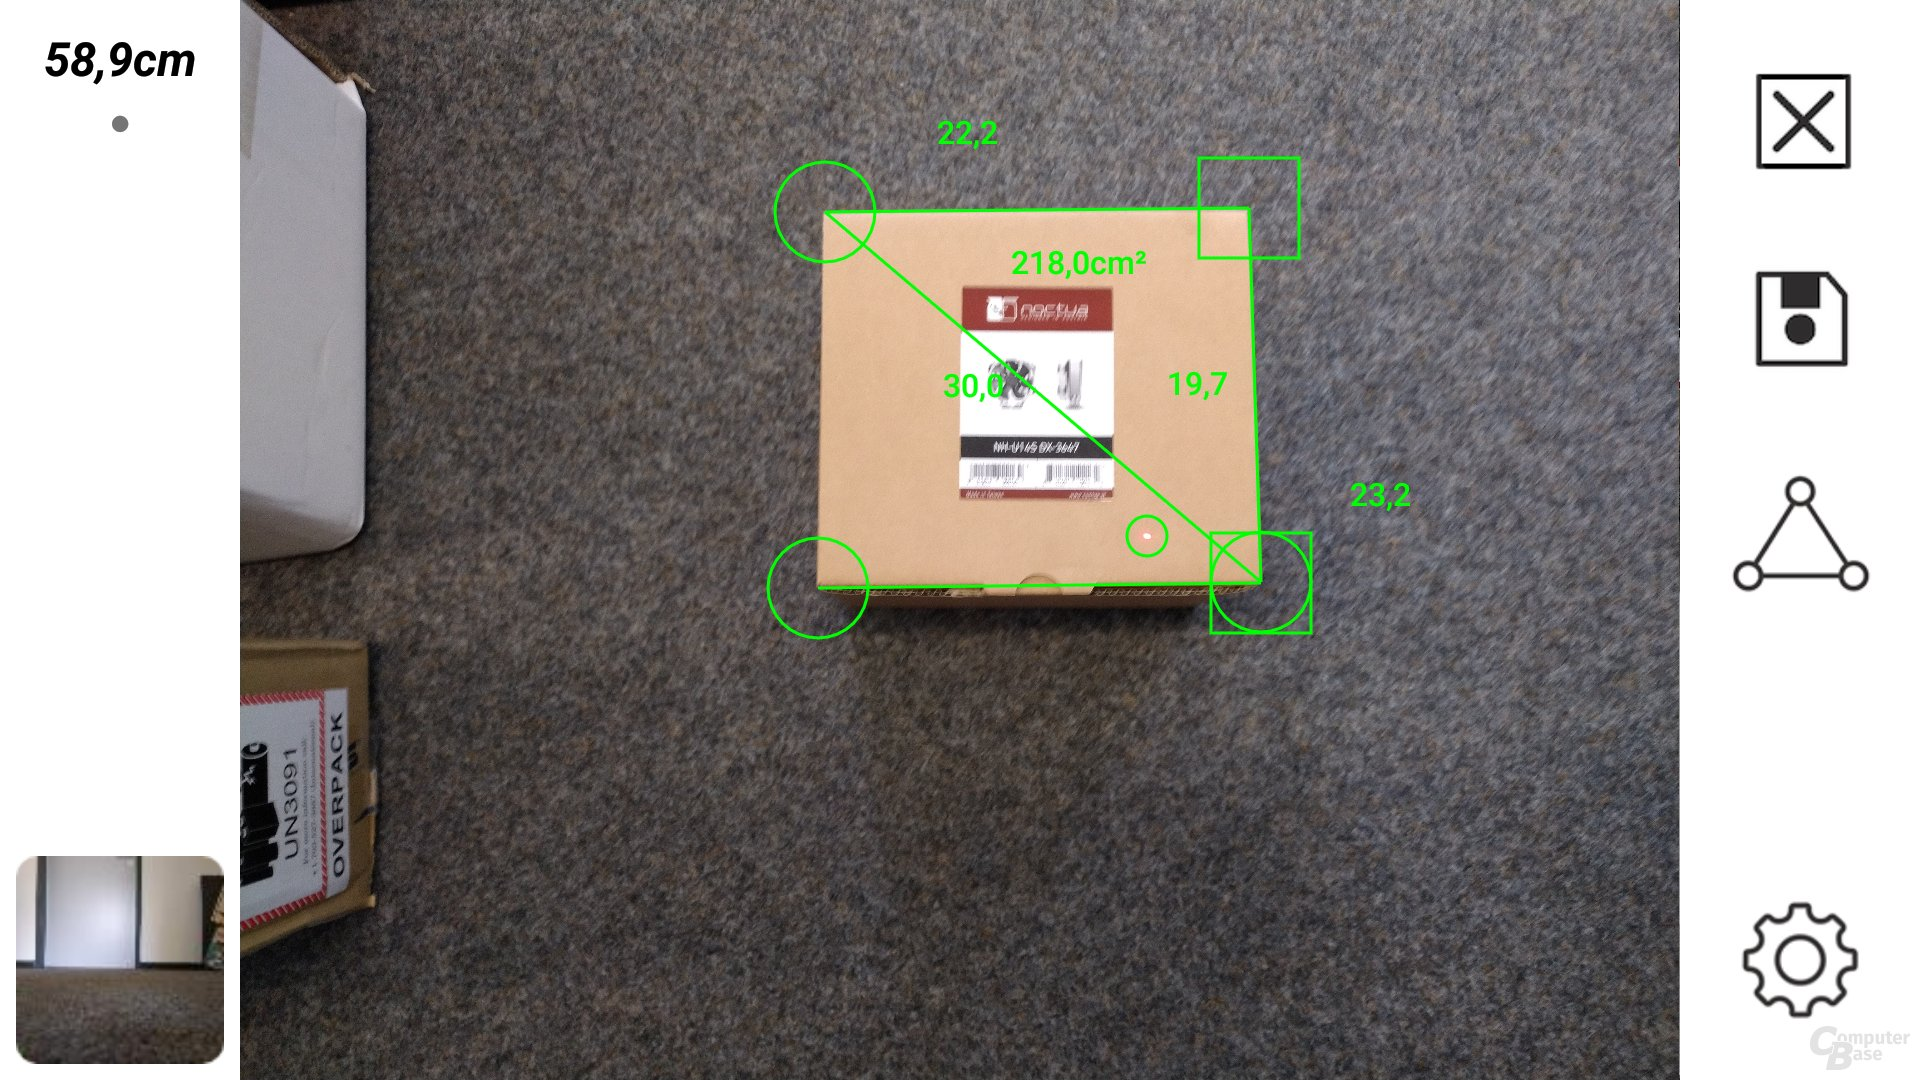 Nikon Prostaff 3i Entfernungsmesser Test : Iphone entfernungsmesser nikon: aktuelle angebote kaufroboter die